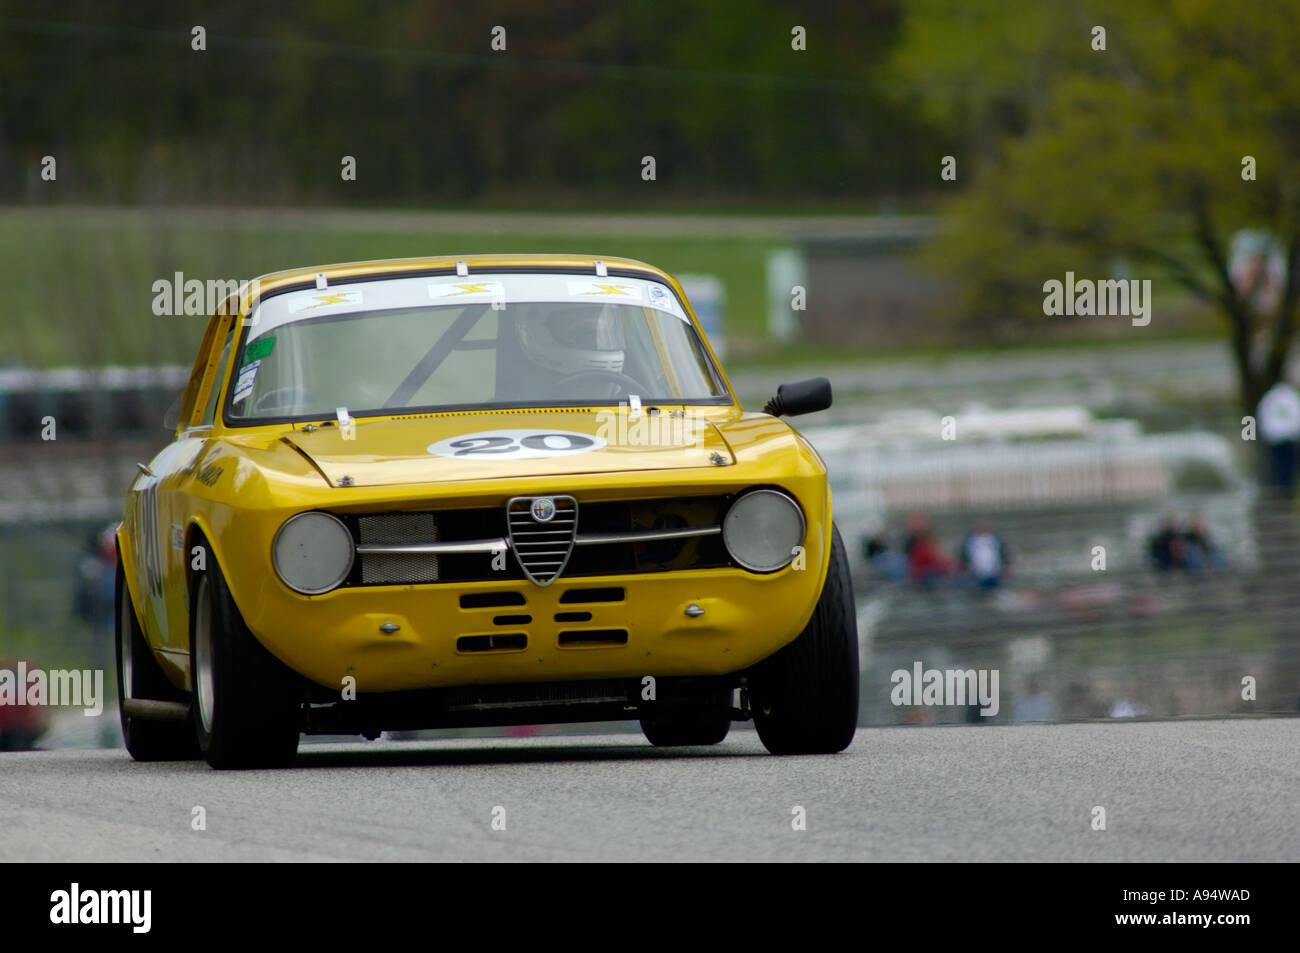 Sportscar Vintage Racing Association Stock Photos & Sportscar ...